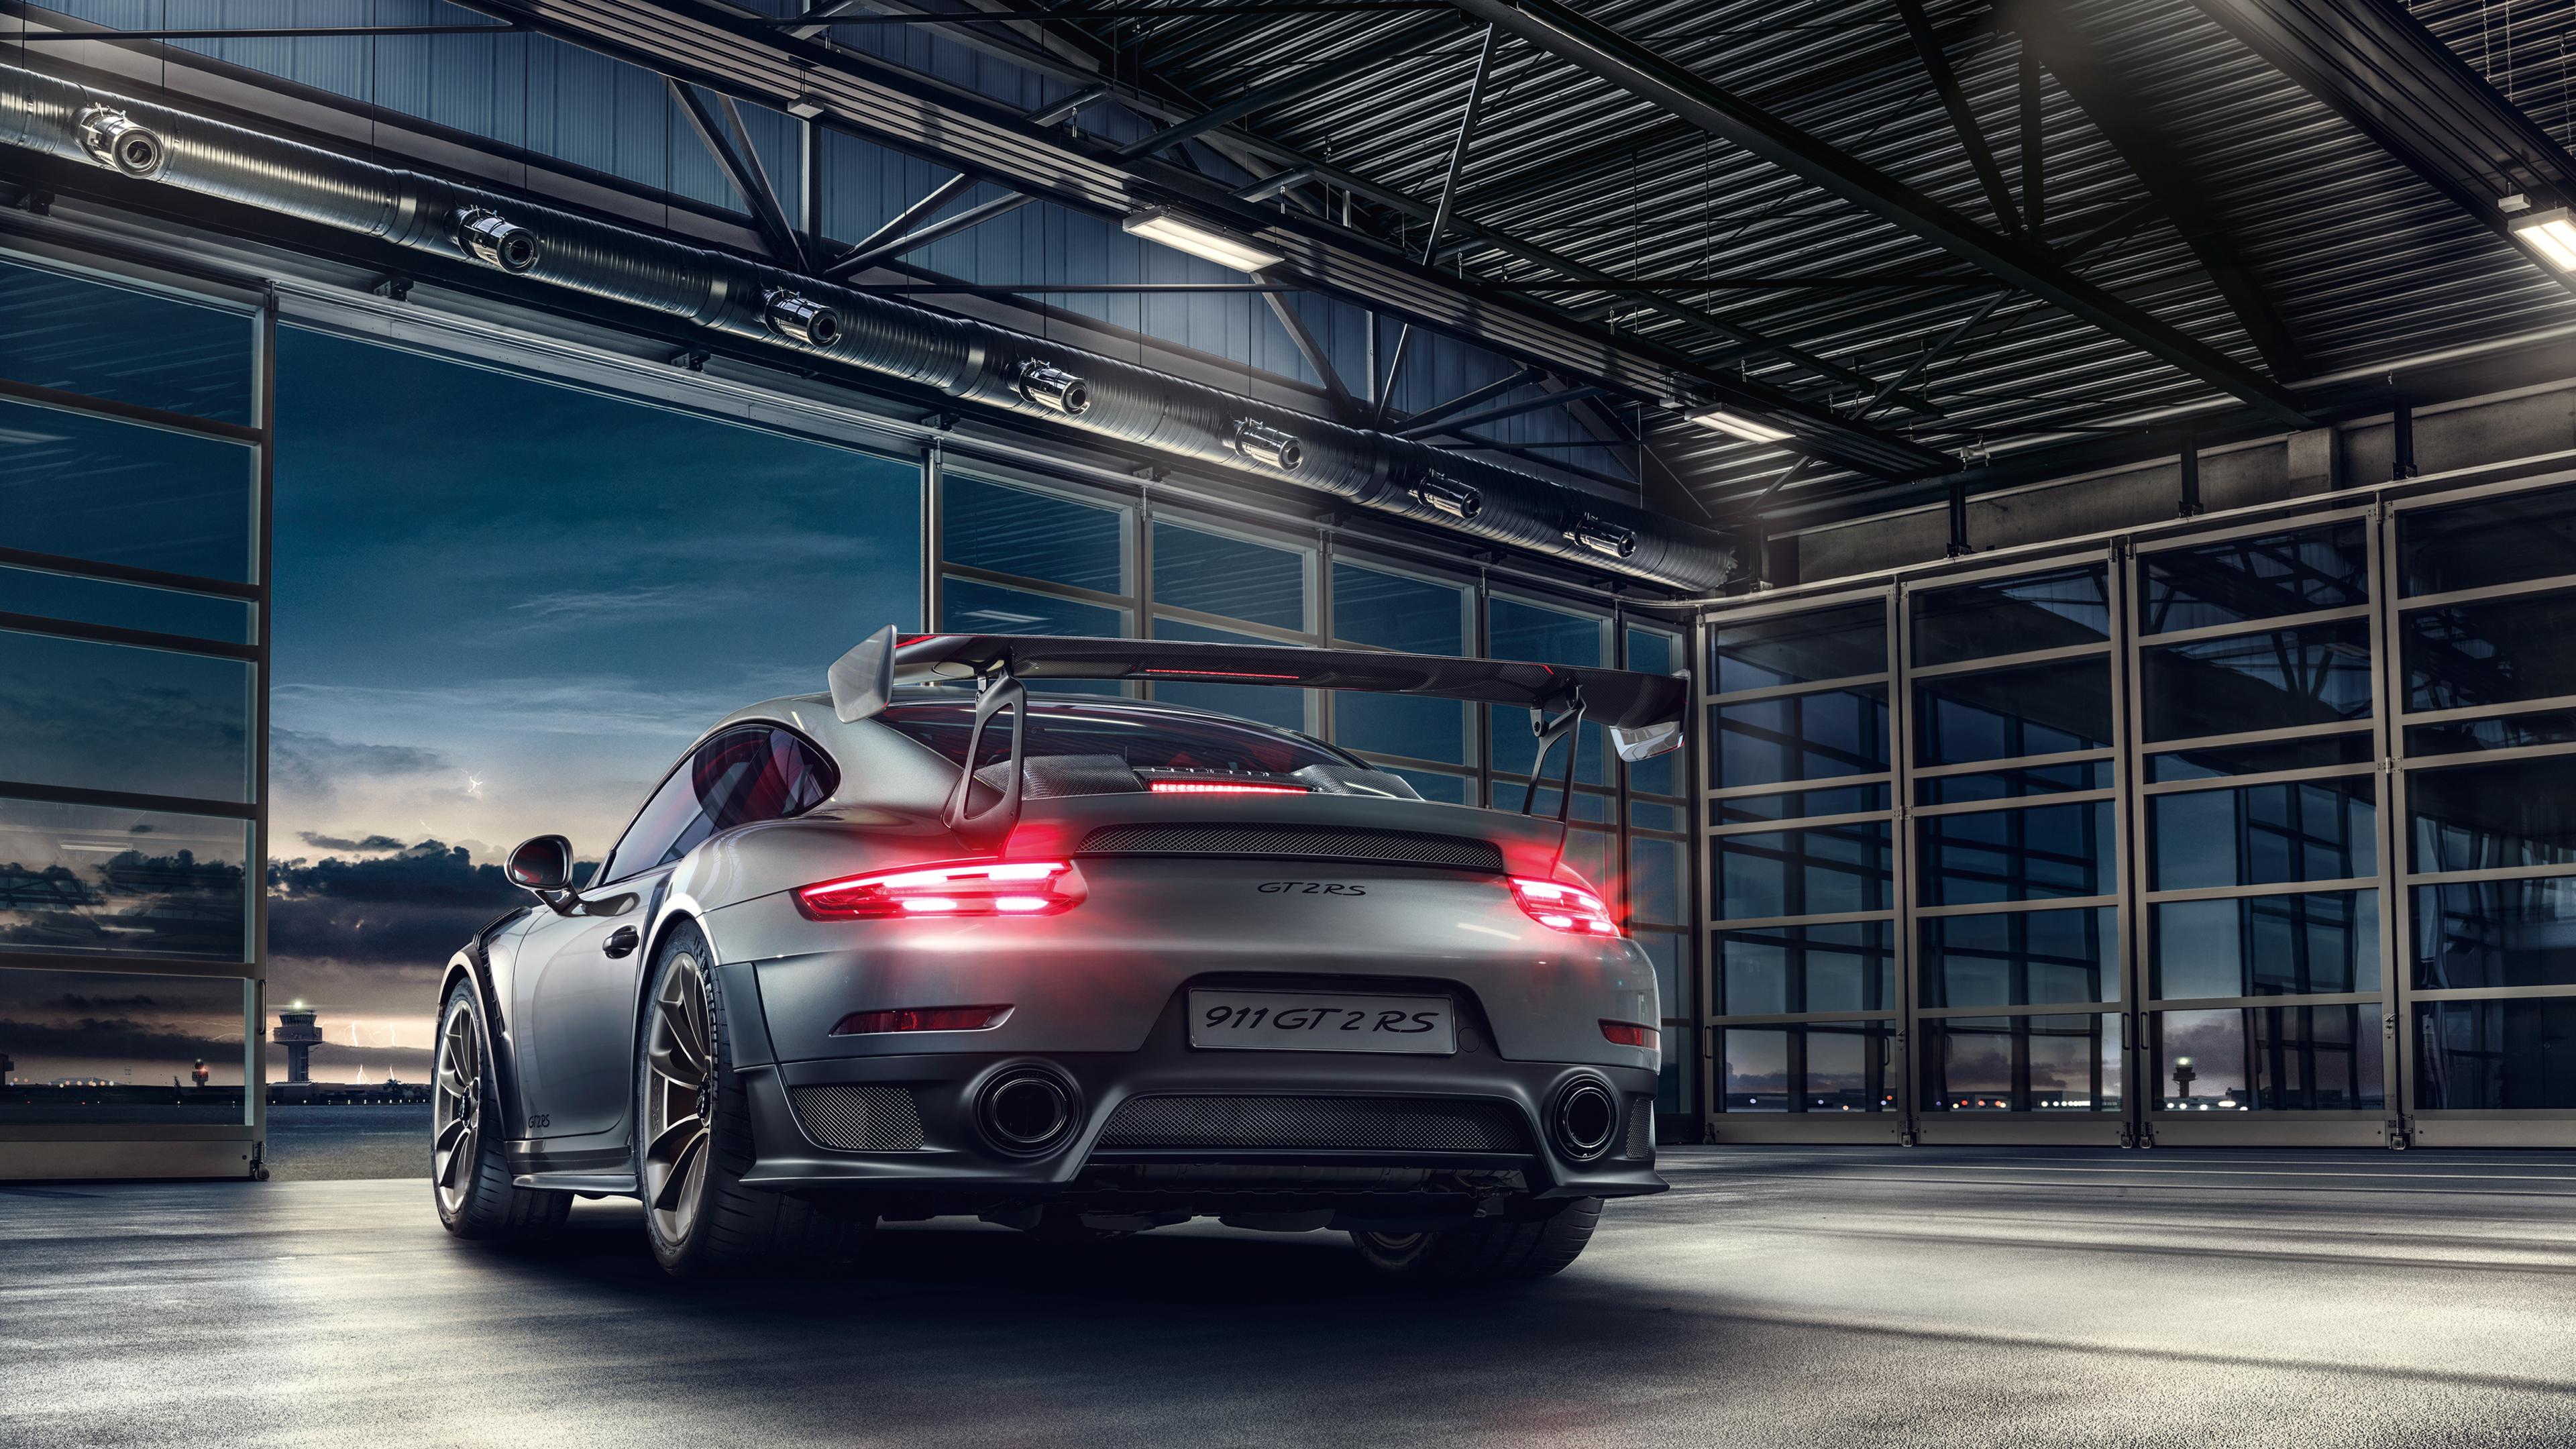 2019 porsche 911 gt2 rs rear 1569189178 - 2019 Porsche 911 GT2 RS Rear - porsche wallpapers, porsche 911 wallpapers, porsche 911 gt2 r wallpapers, hd-wallpapers, cars wallpapers, behance wallpapers, artist wallpapers, 4k-wallpapers, 2019 cars wallpapers